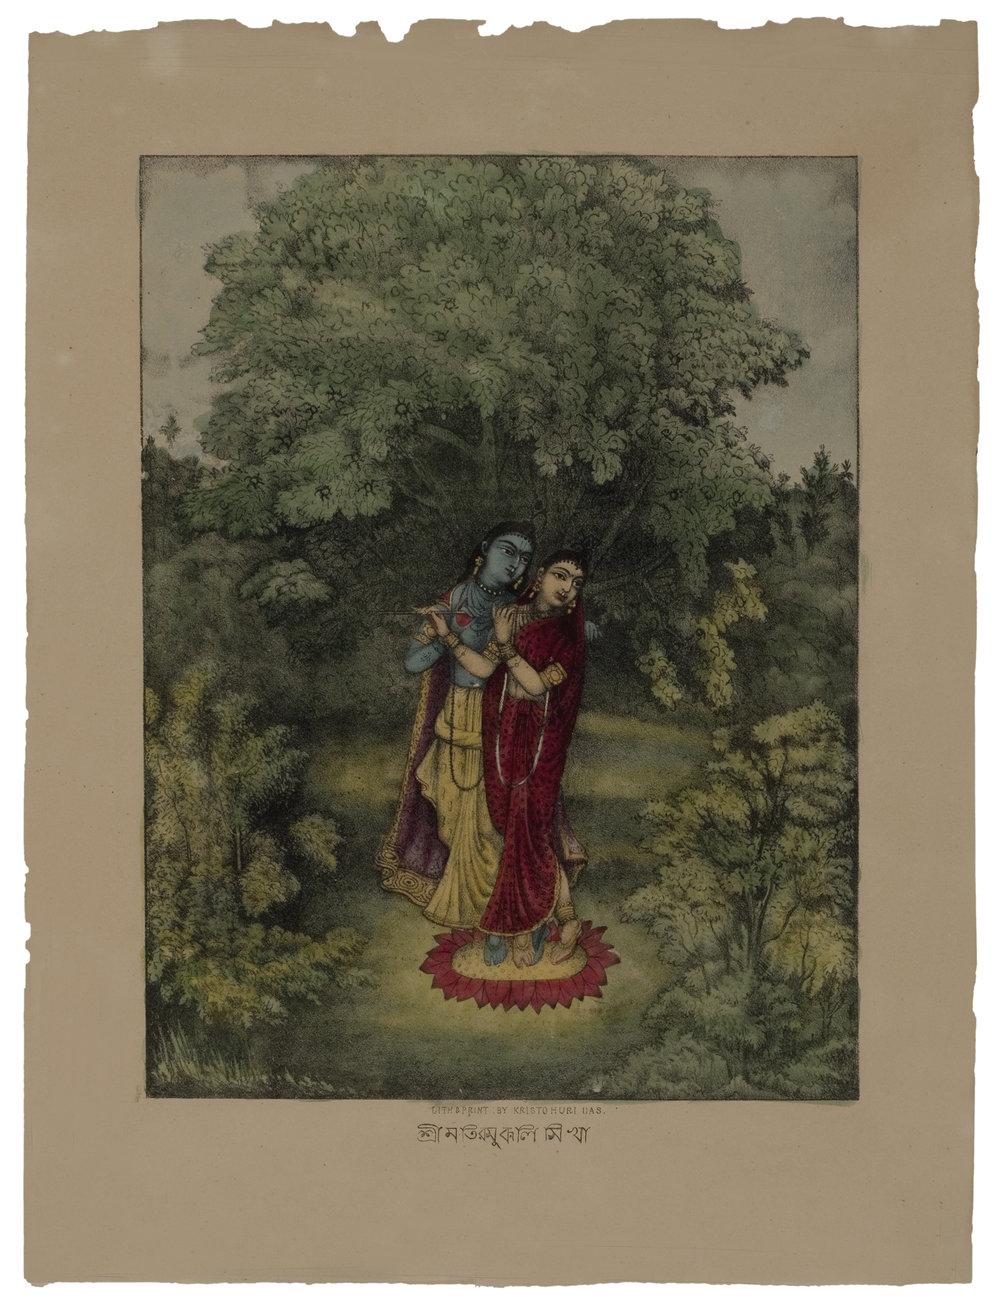 Radha Krishna, c. 1880